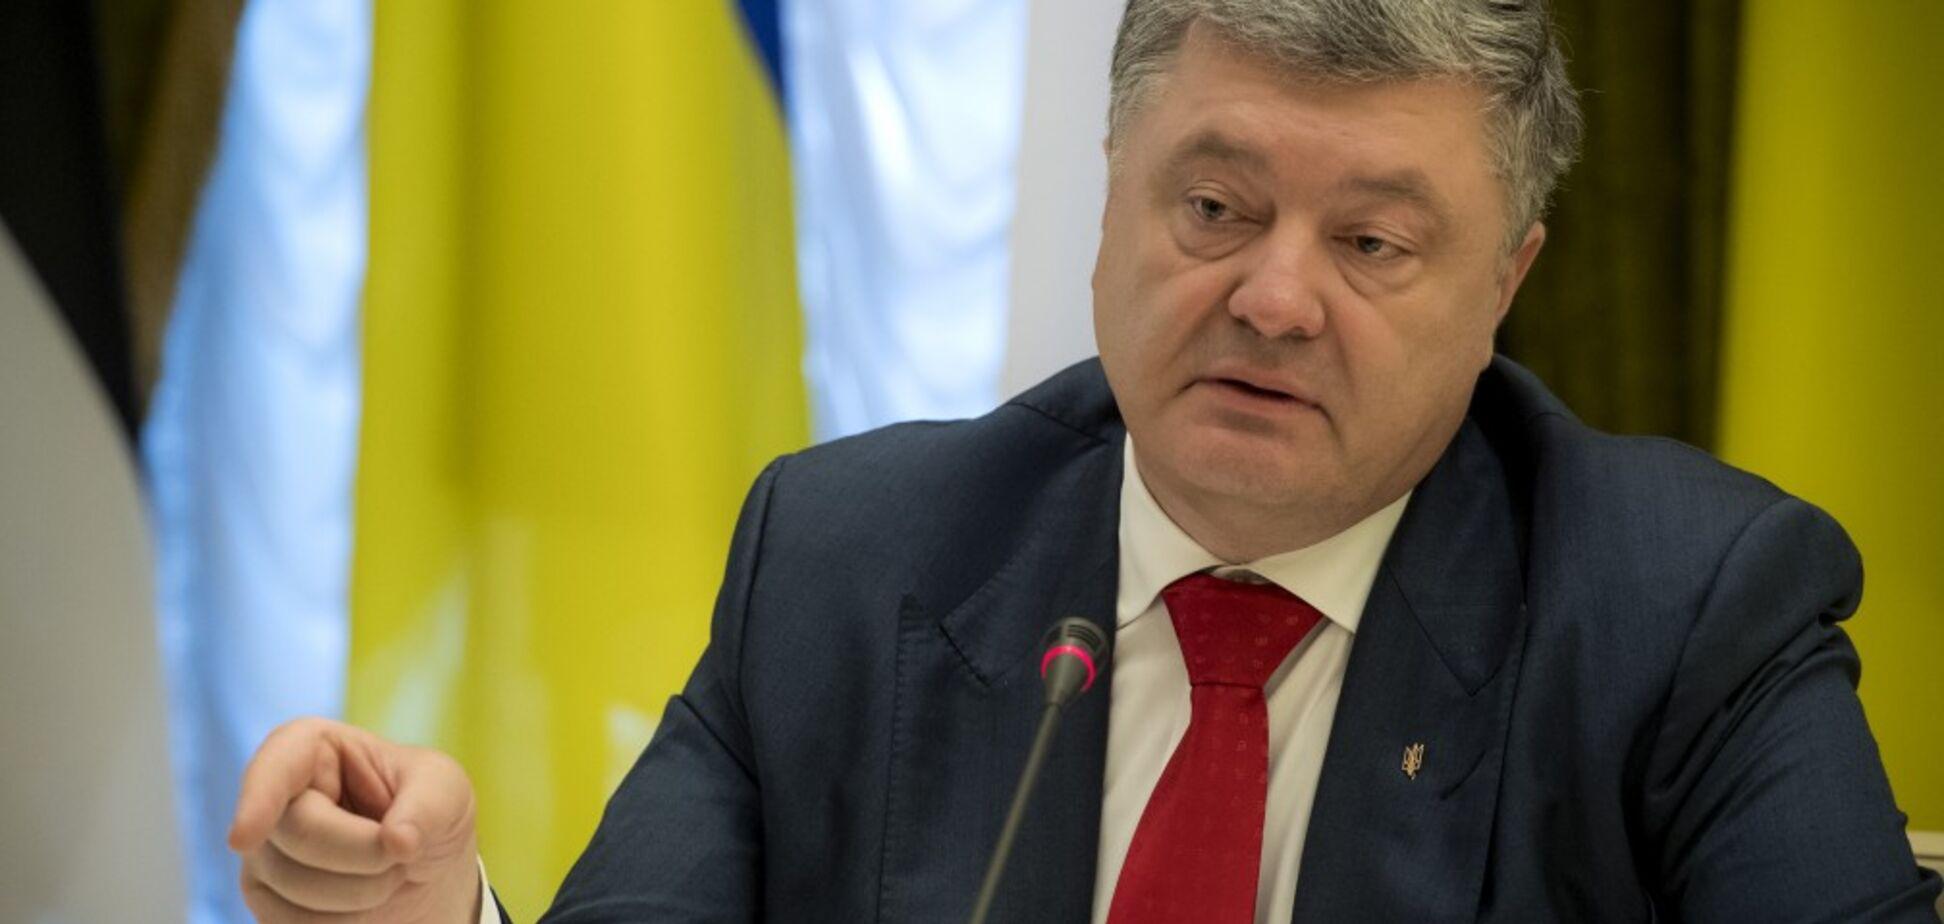 Петр Порошенко. Источник: president.gov